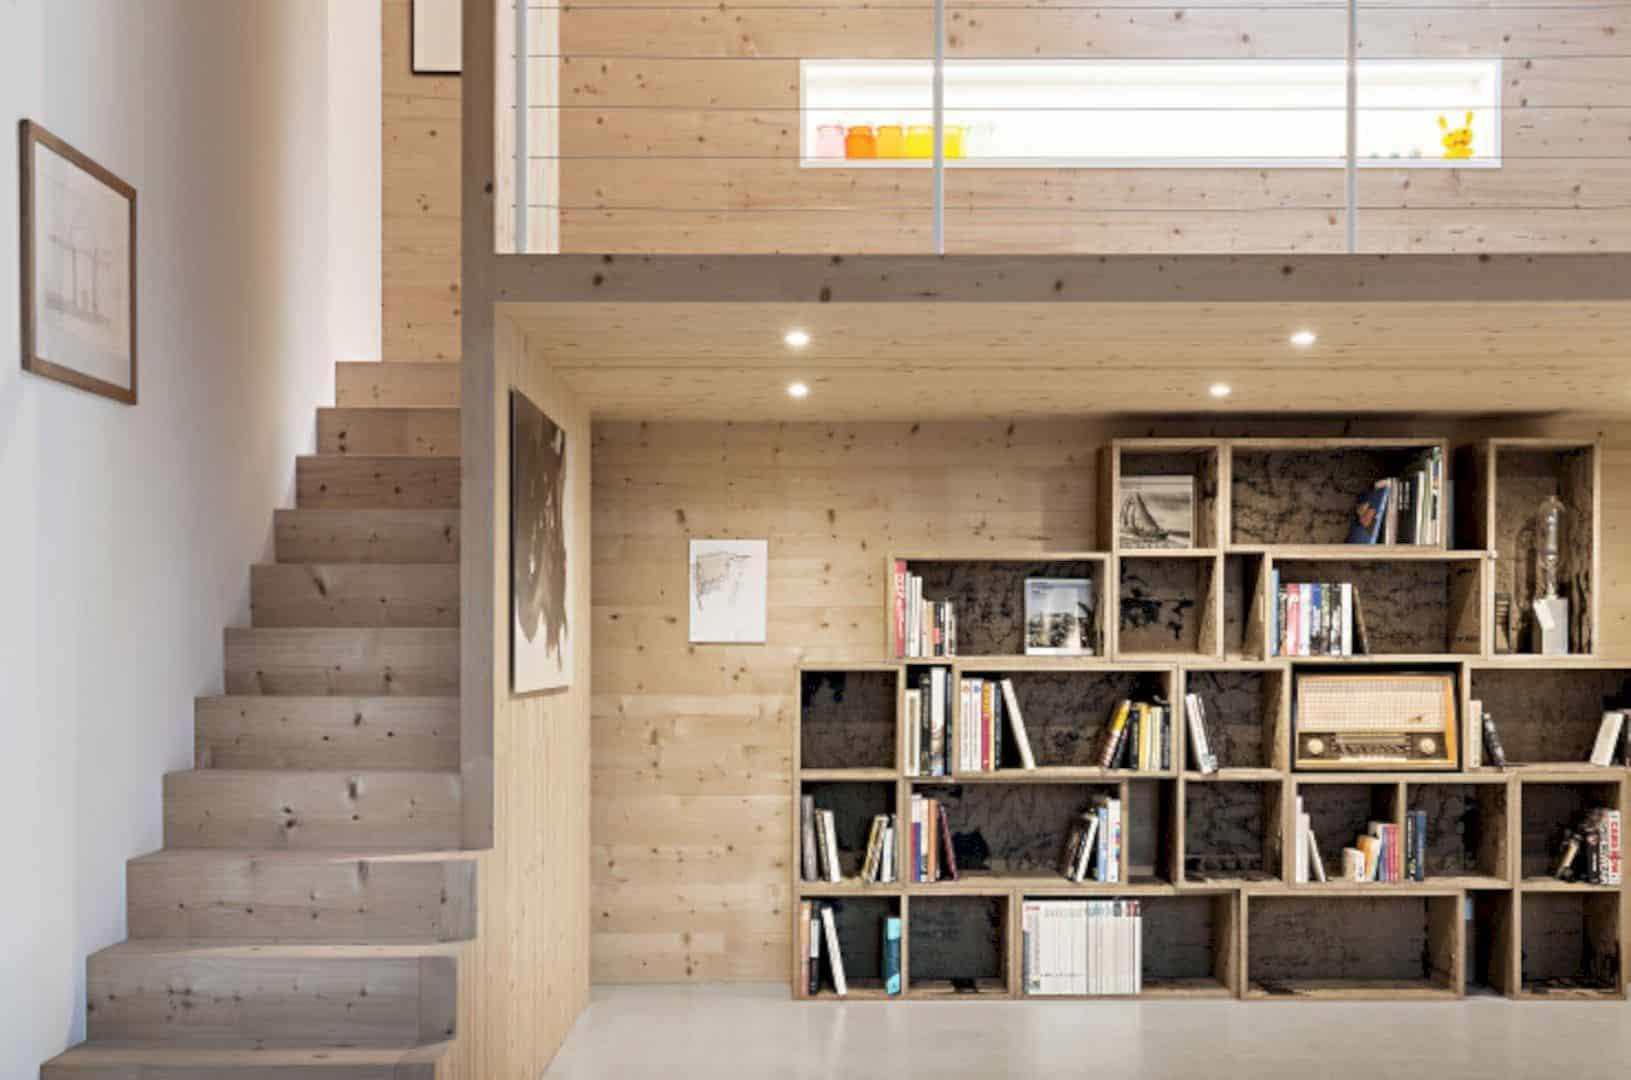 Studio Franz Messner Renovation 6